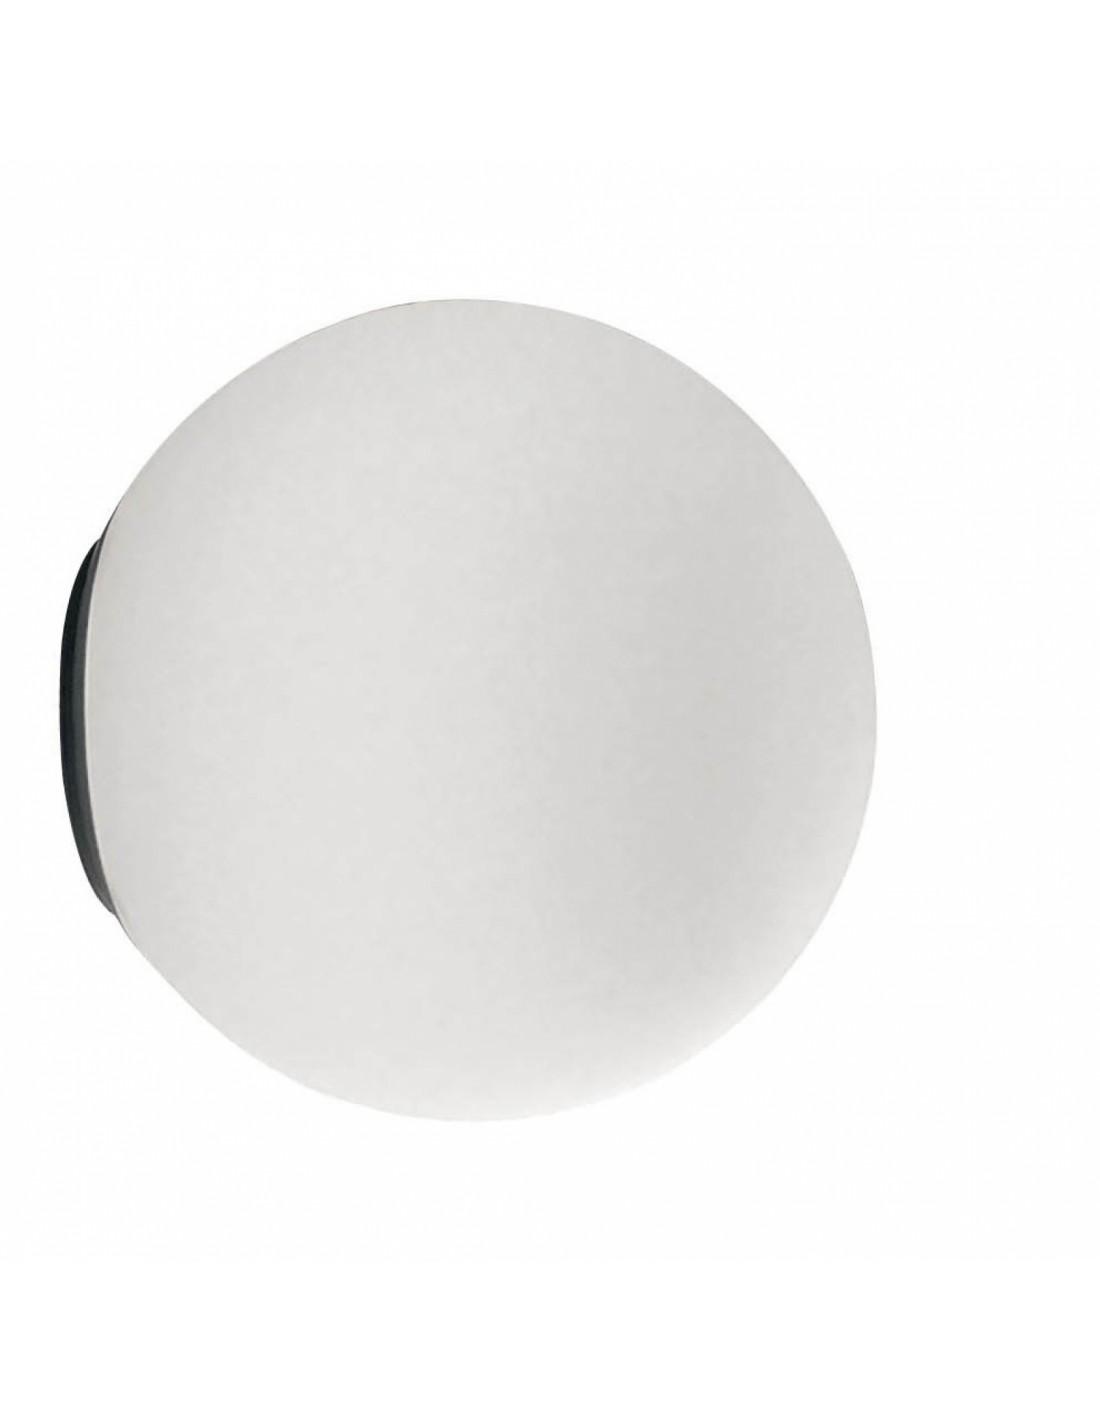 applique dioscuri 25  design en verre soufflé blanc artemide